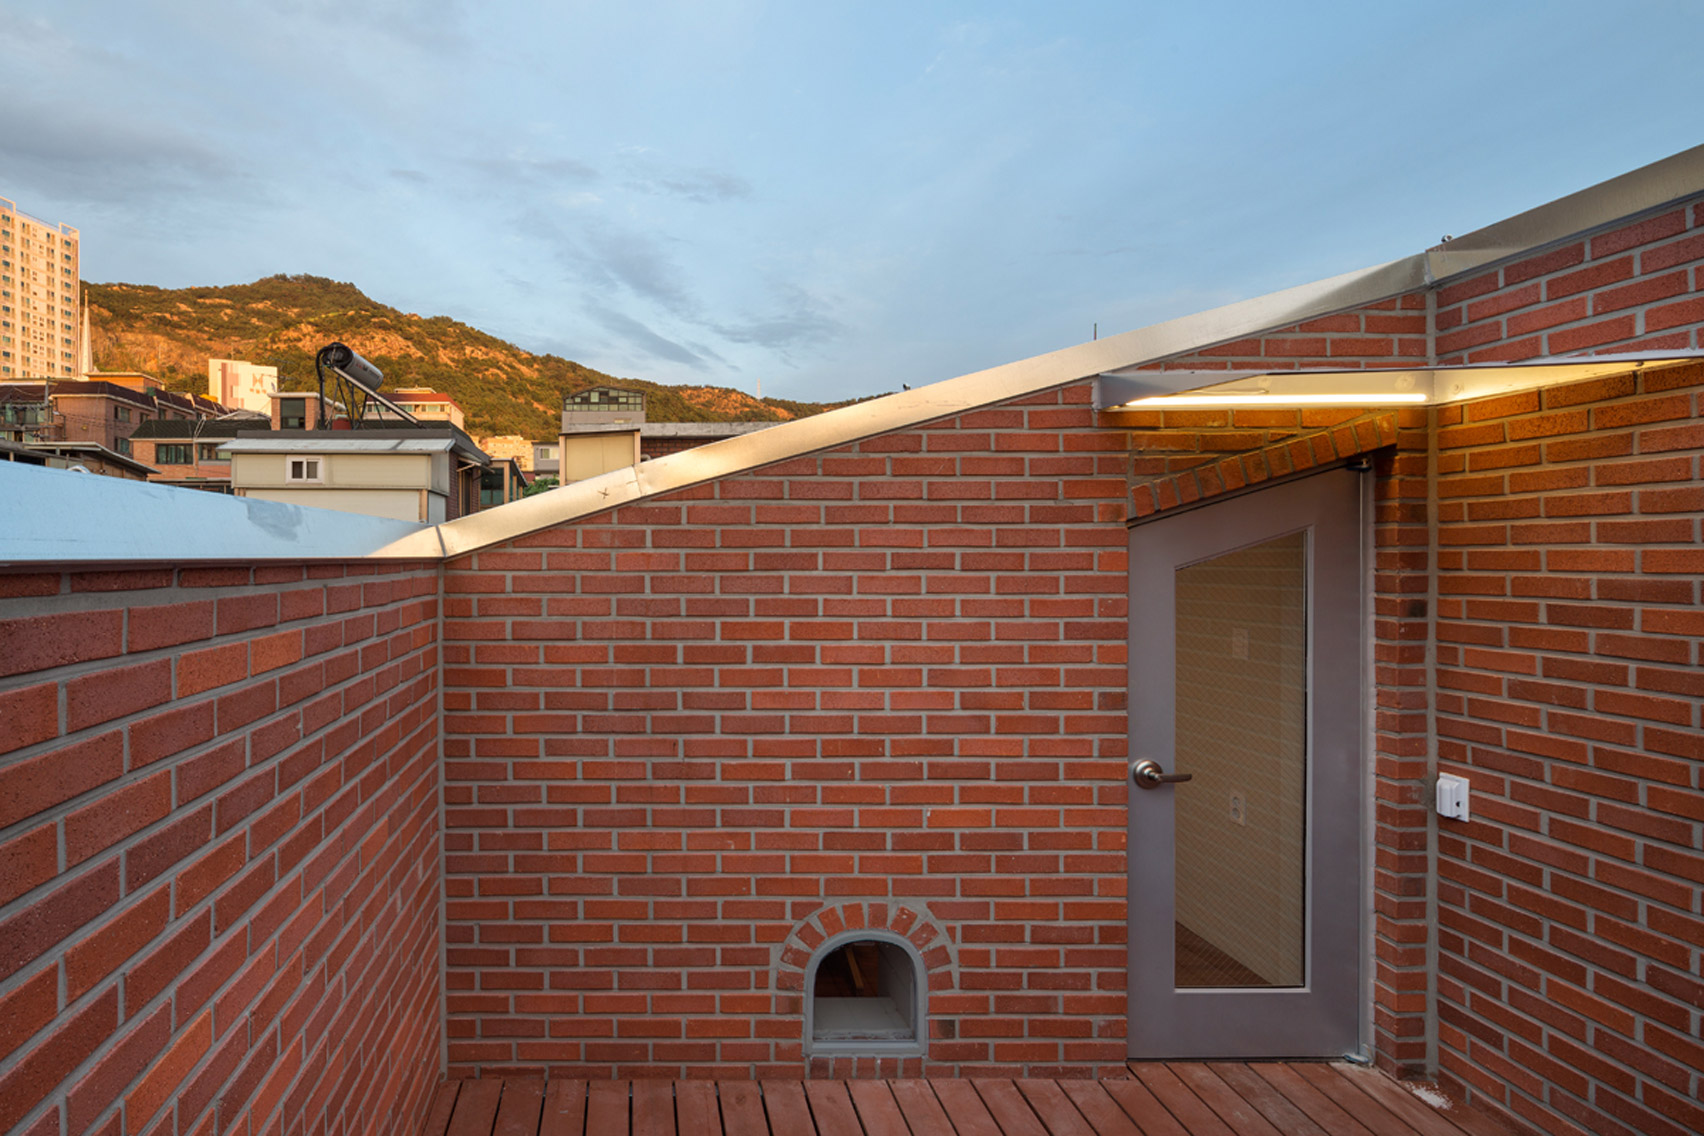 grown-house-fhhh-friends-architecture-residential-seoul-south-korea_dezeen_1704_col_29